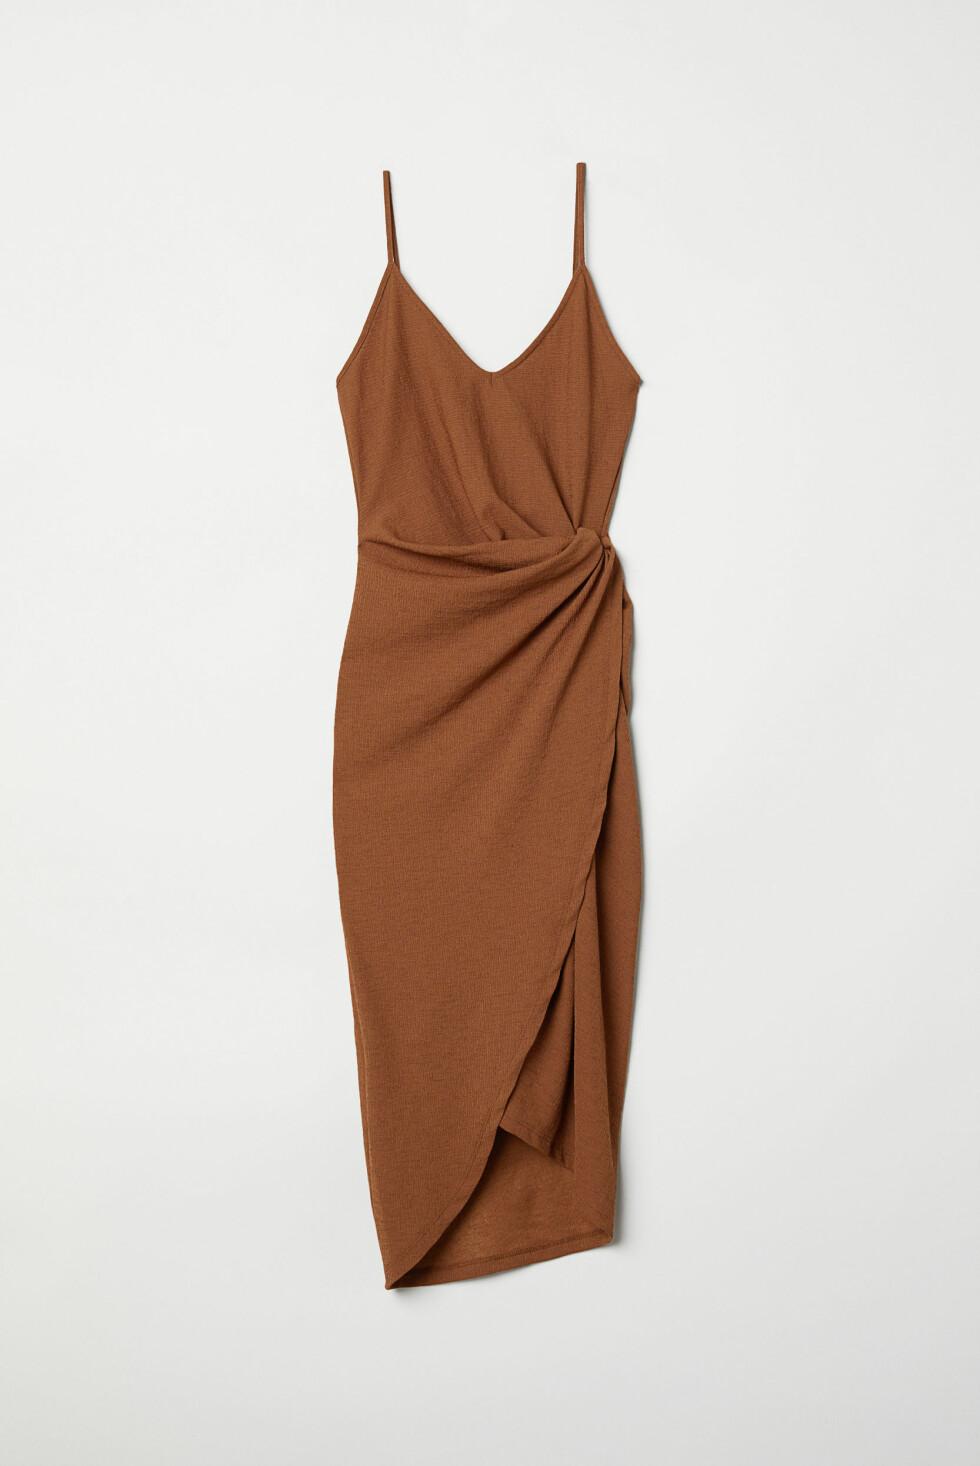 Kjole fra H&M  250,-  http://www2.hm.com/no_no/productpage.0676091009.html